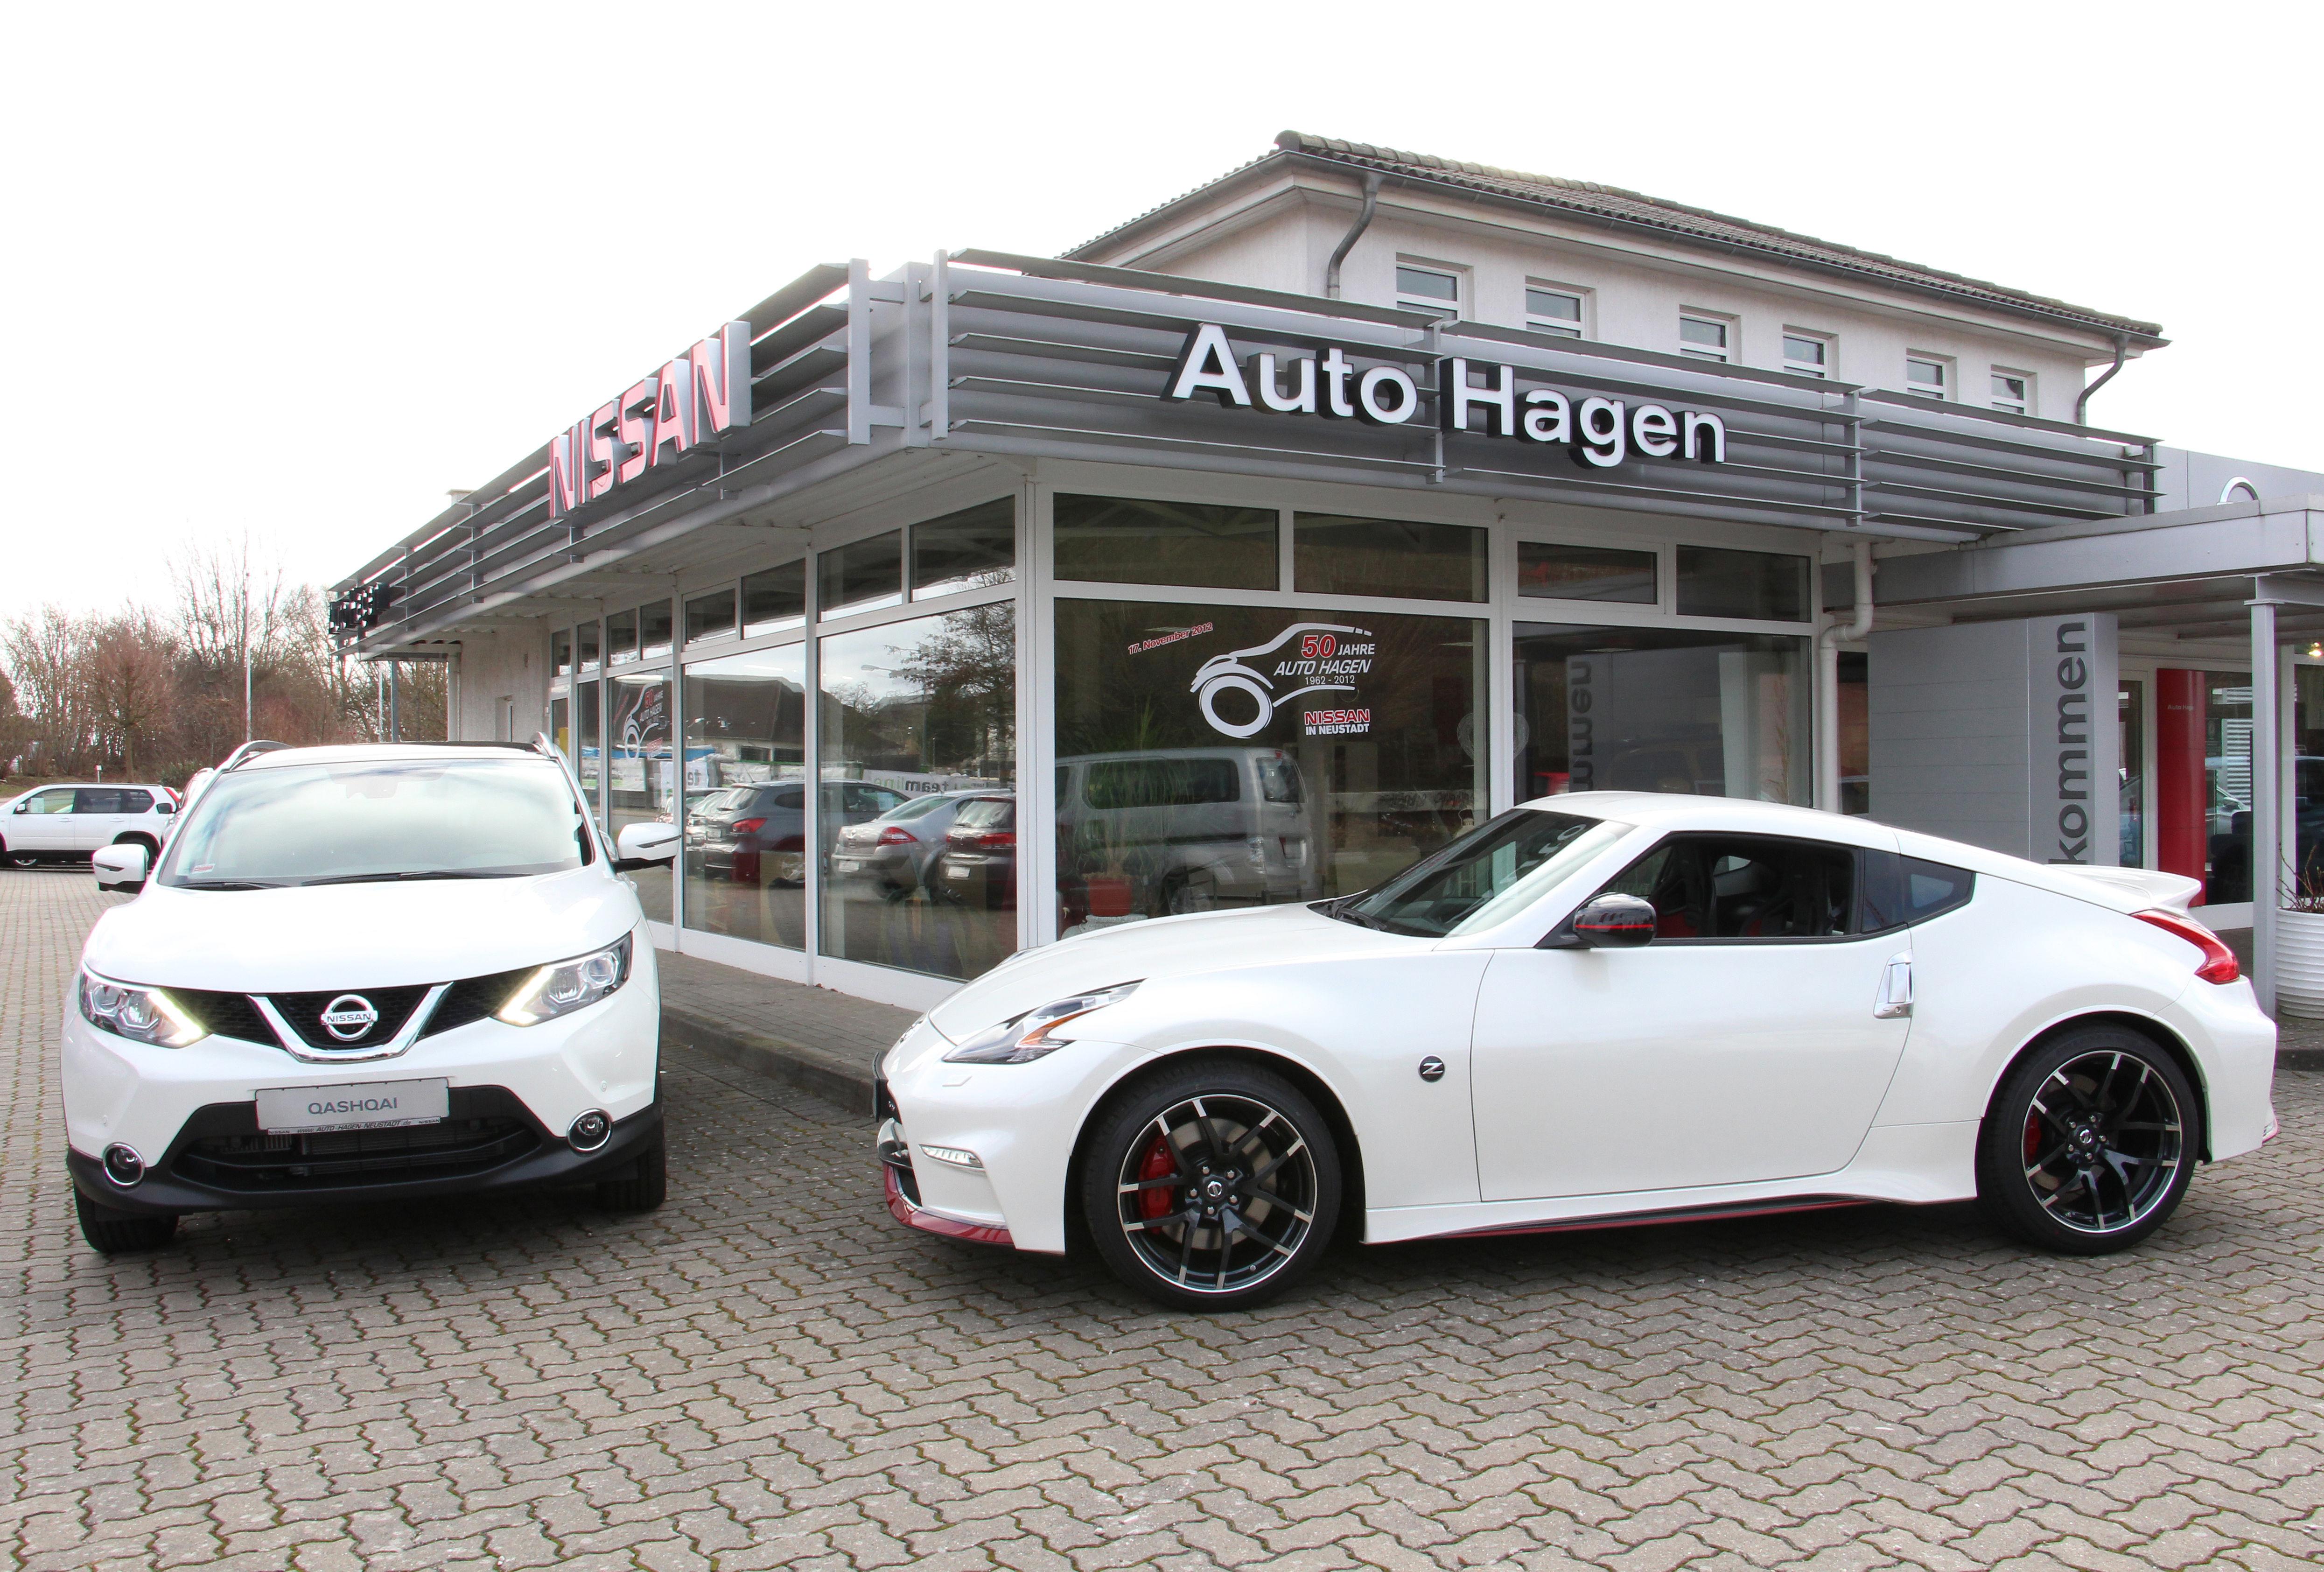 Autos In Hagen